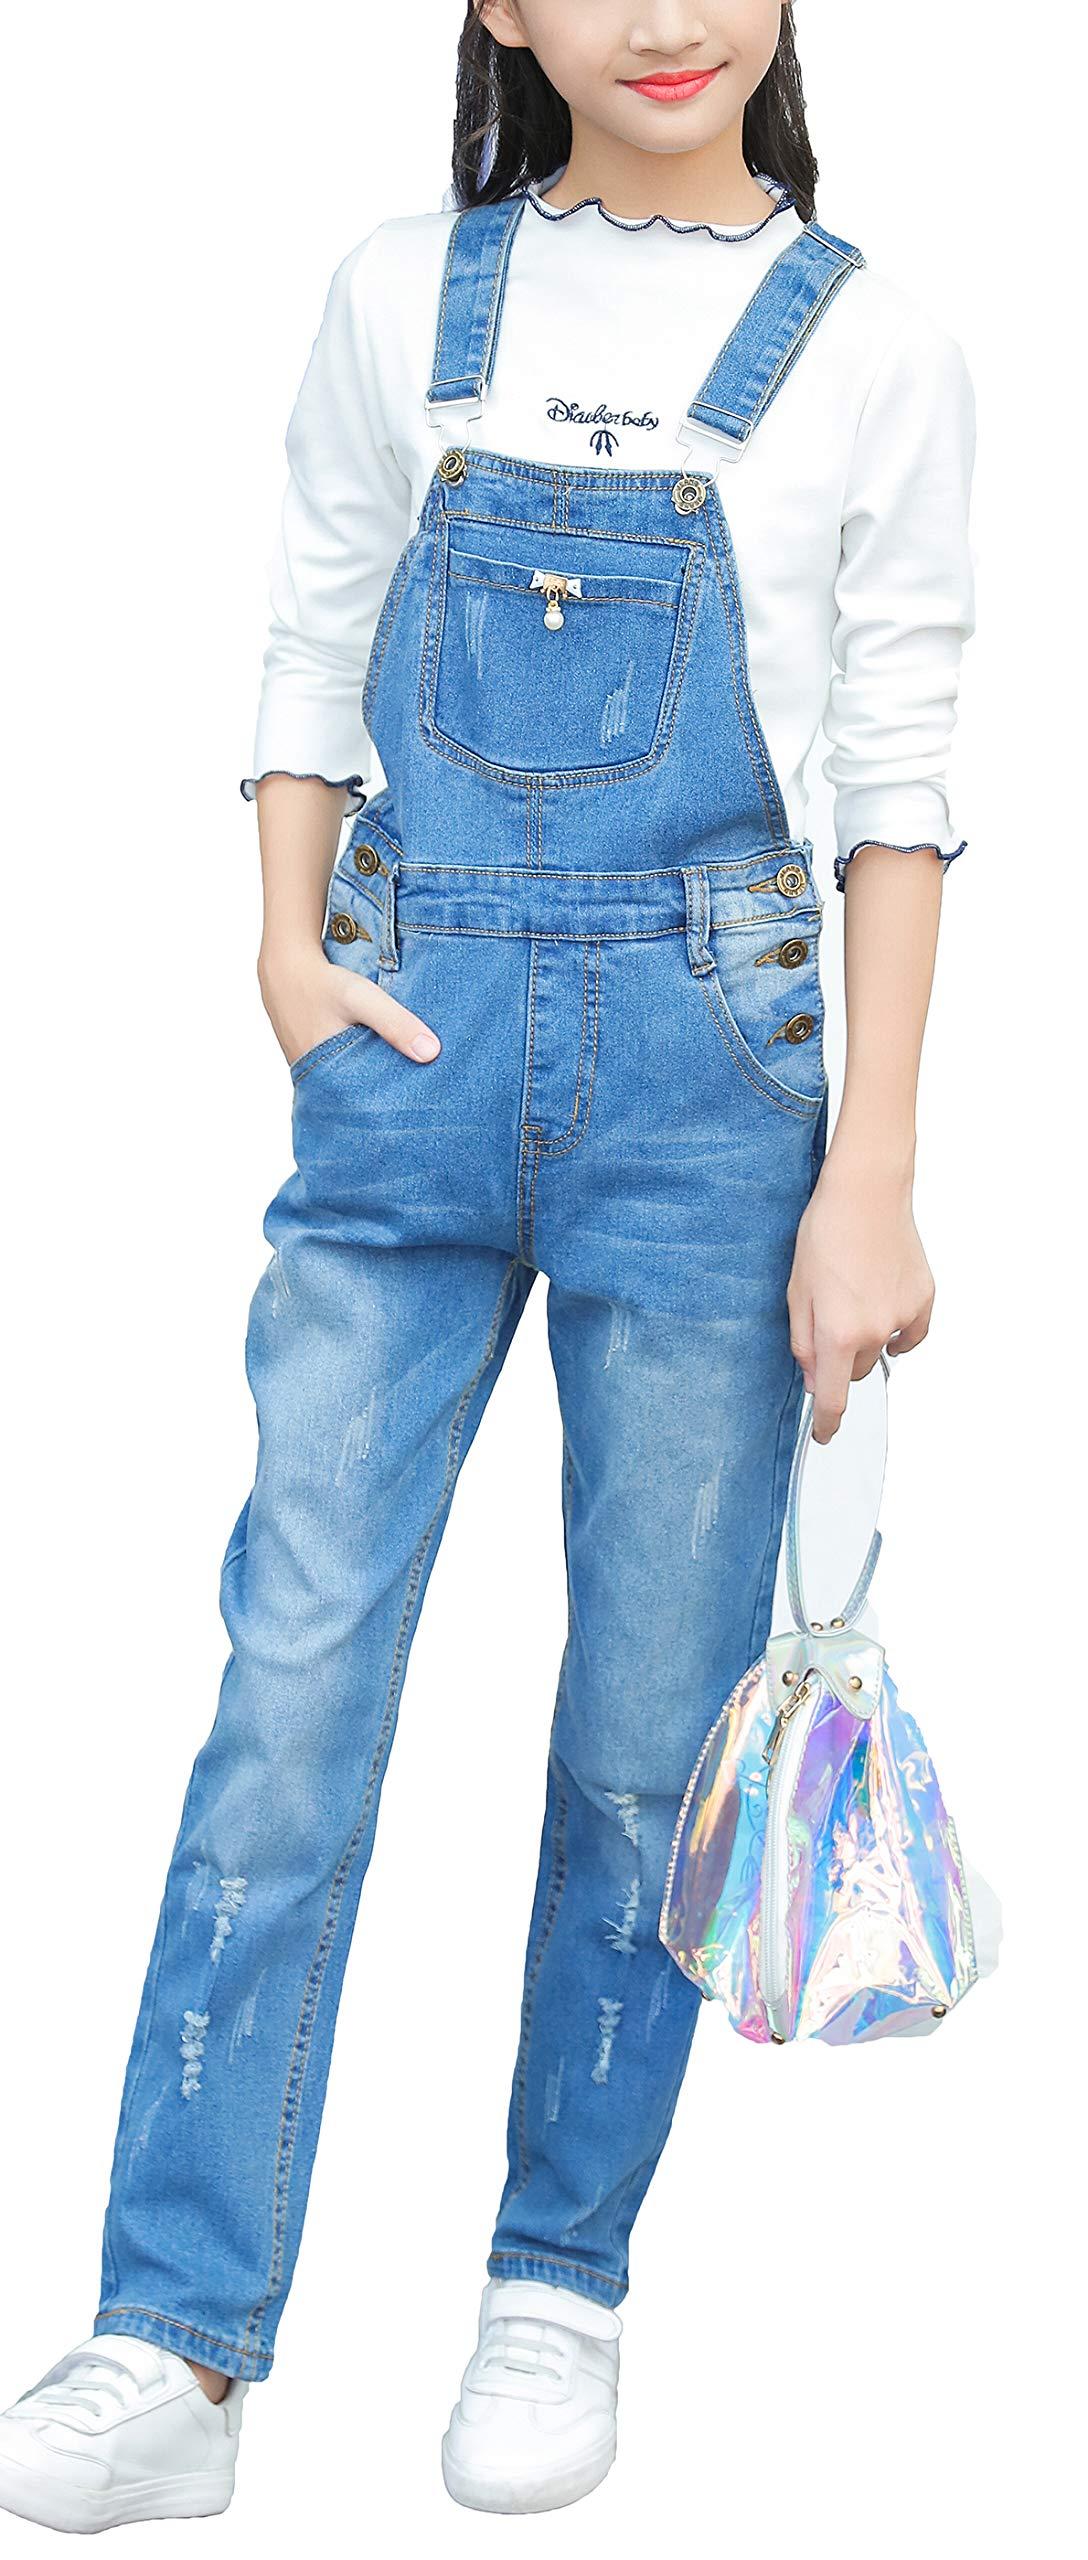 Luodemiss Big Girl's Light Blue Denim Jumpsuit Boyfriend Jeans Denim Romper Shortalls 6/Light Blue